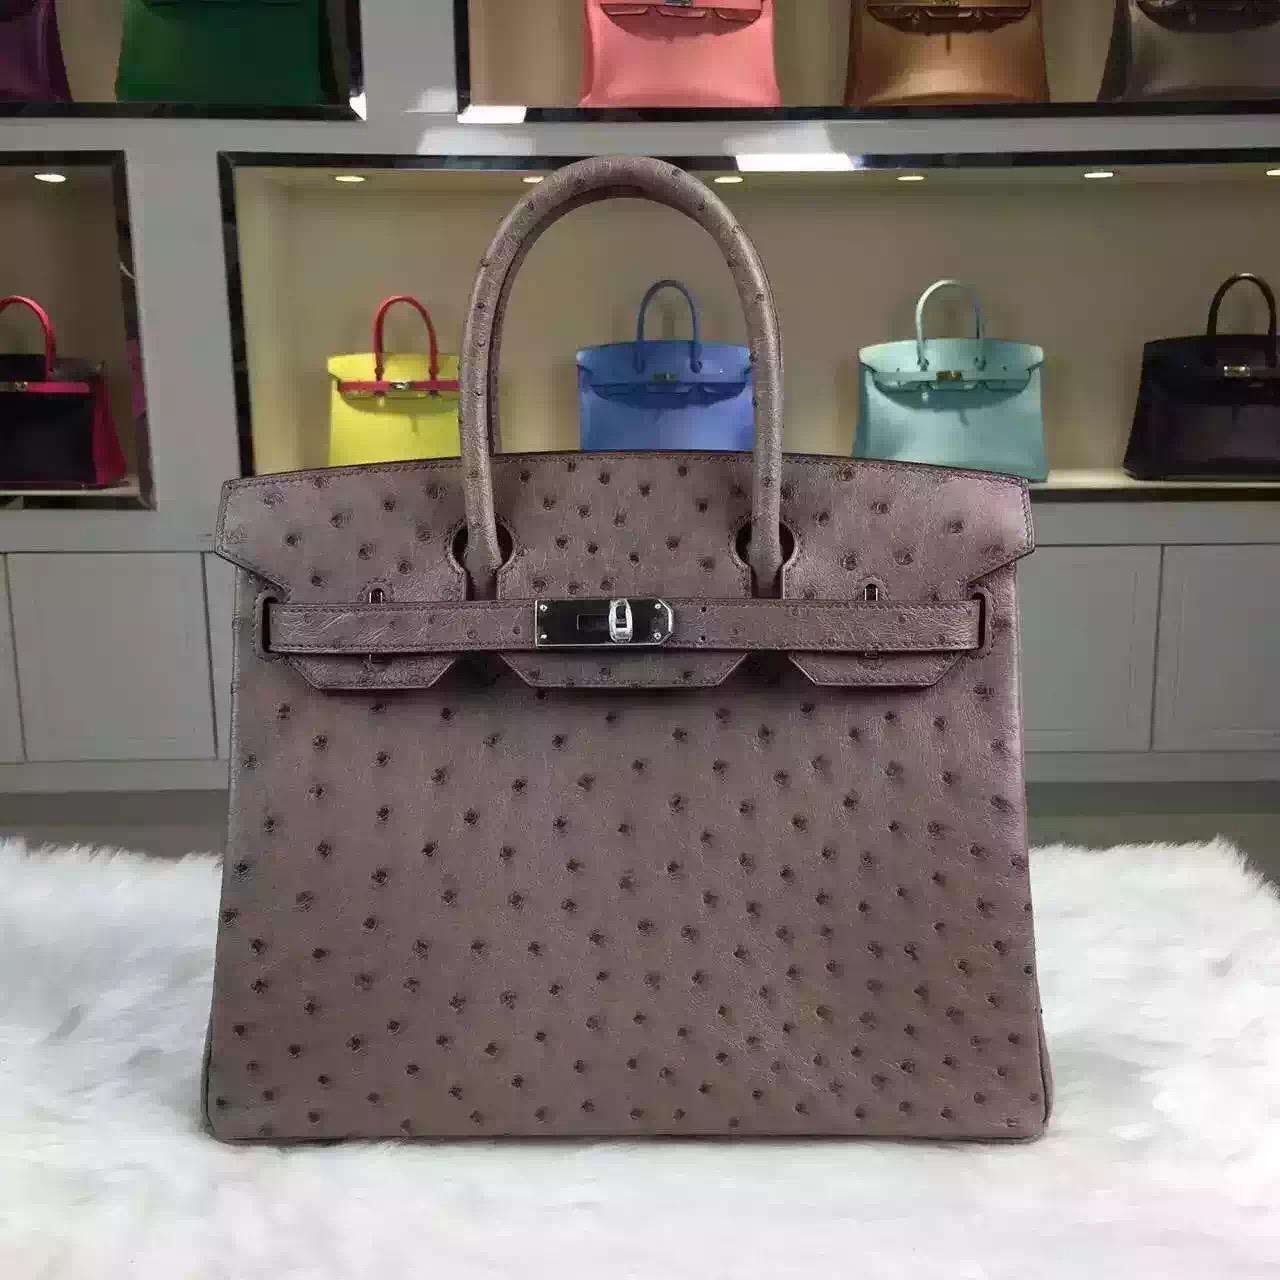 High Quality Hermes Mousse Grey France Ostrich Leather Birkin Bag 30cm